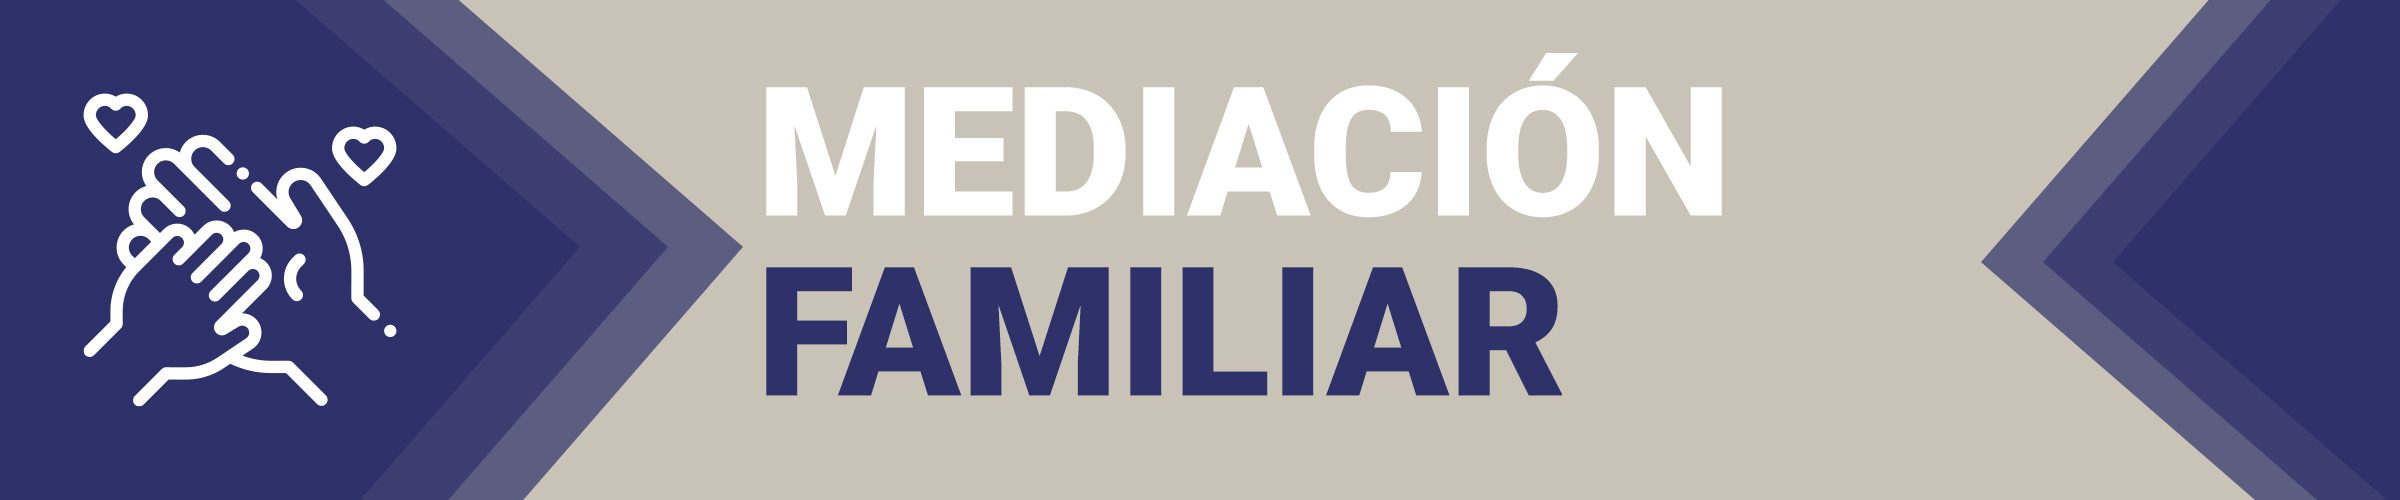 mediacion familiar